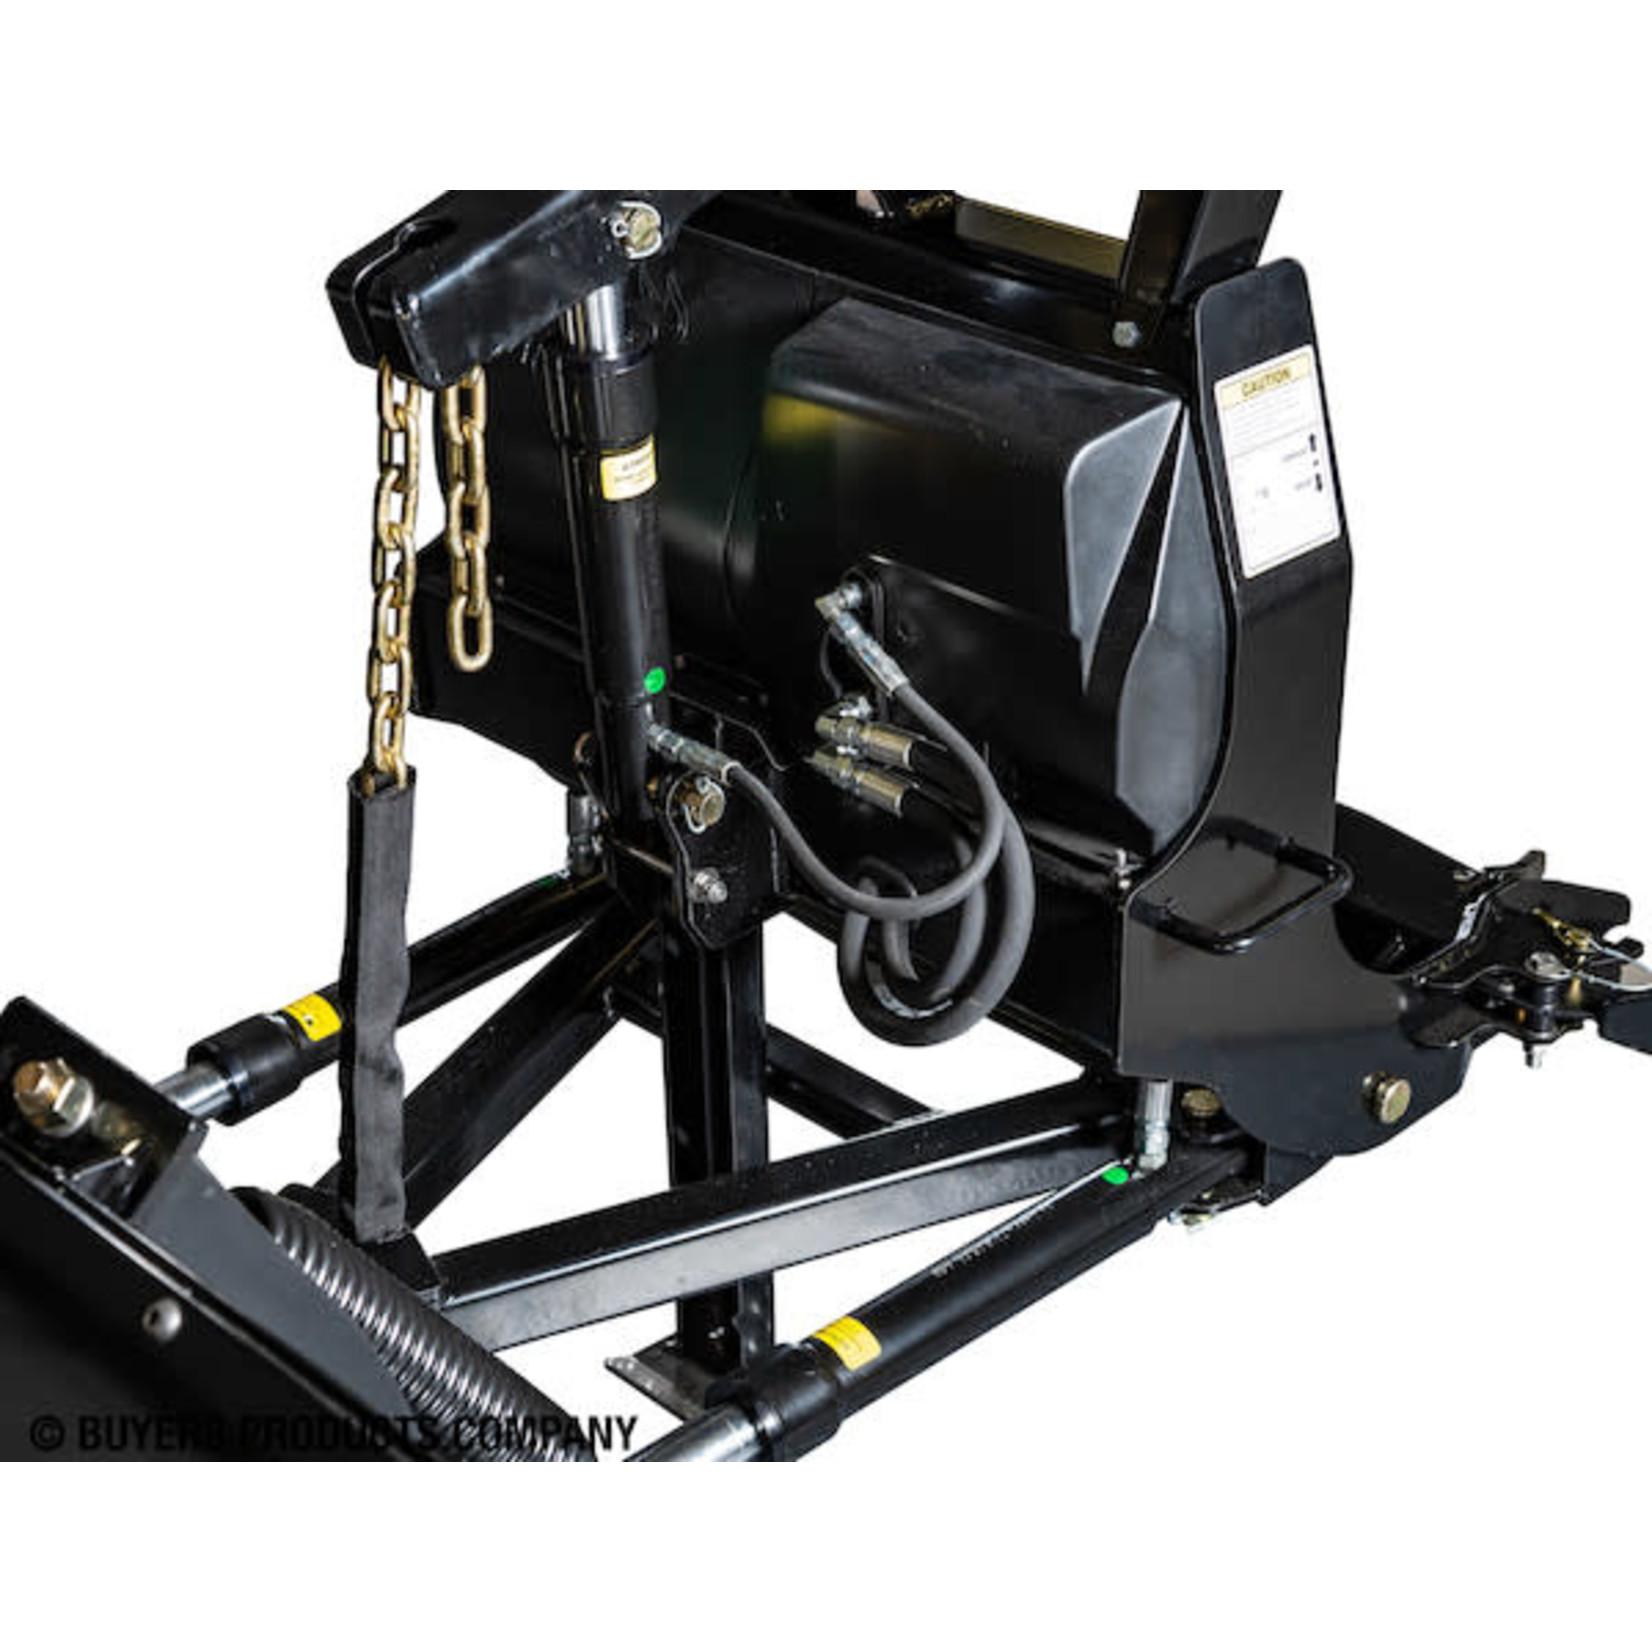 SnowDogg SnowDogg®MDII Series Liftframe